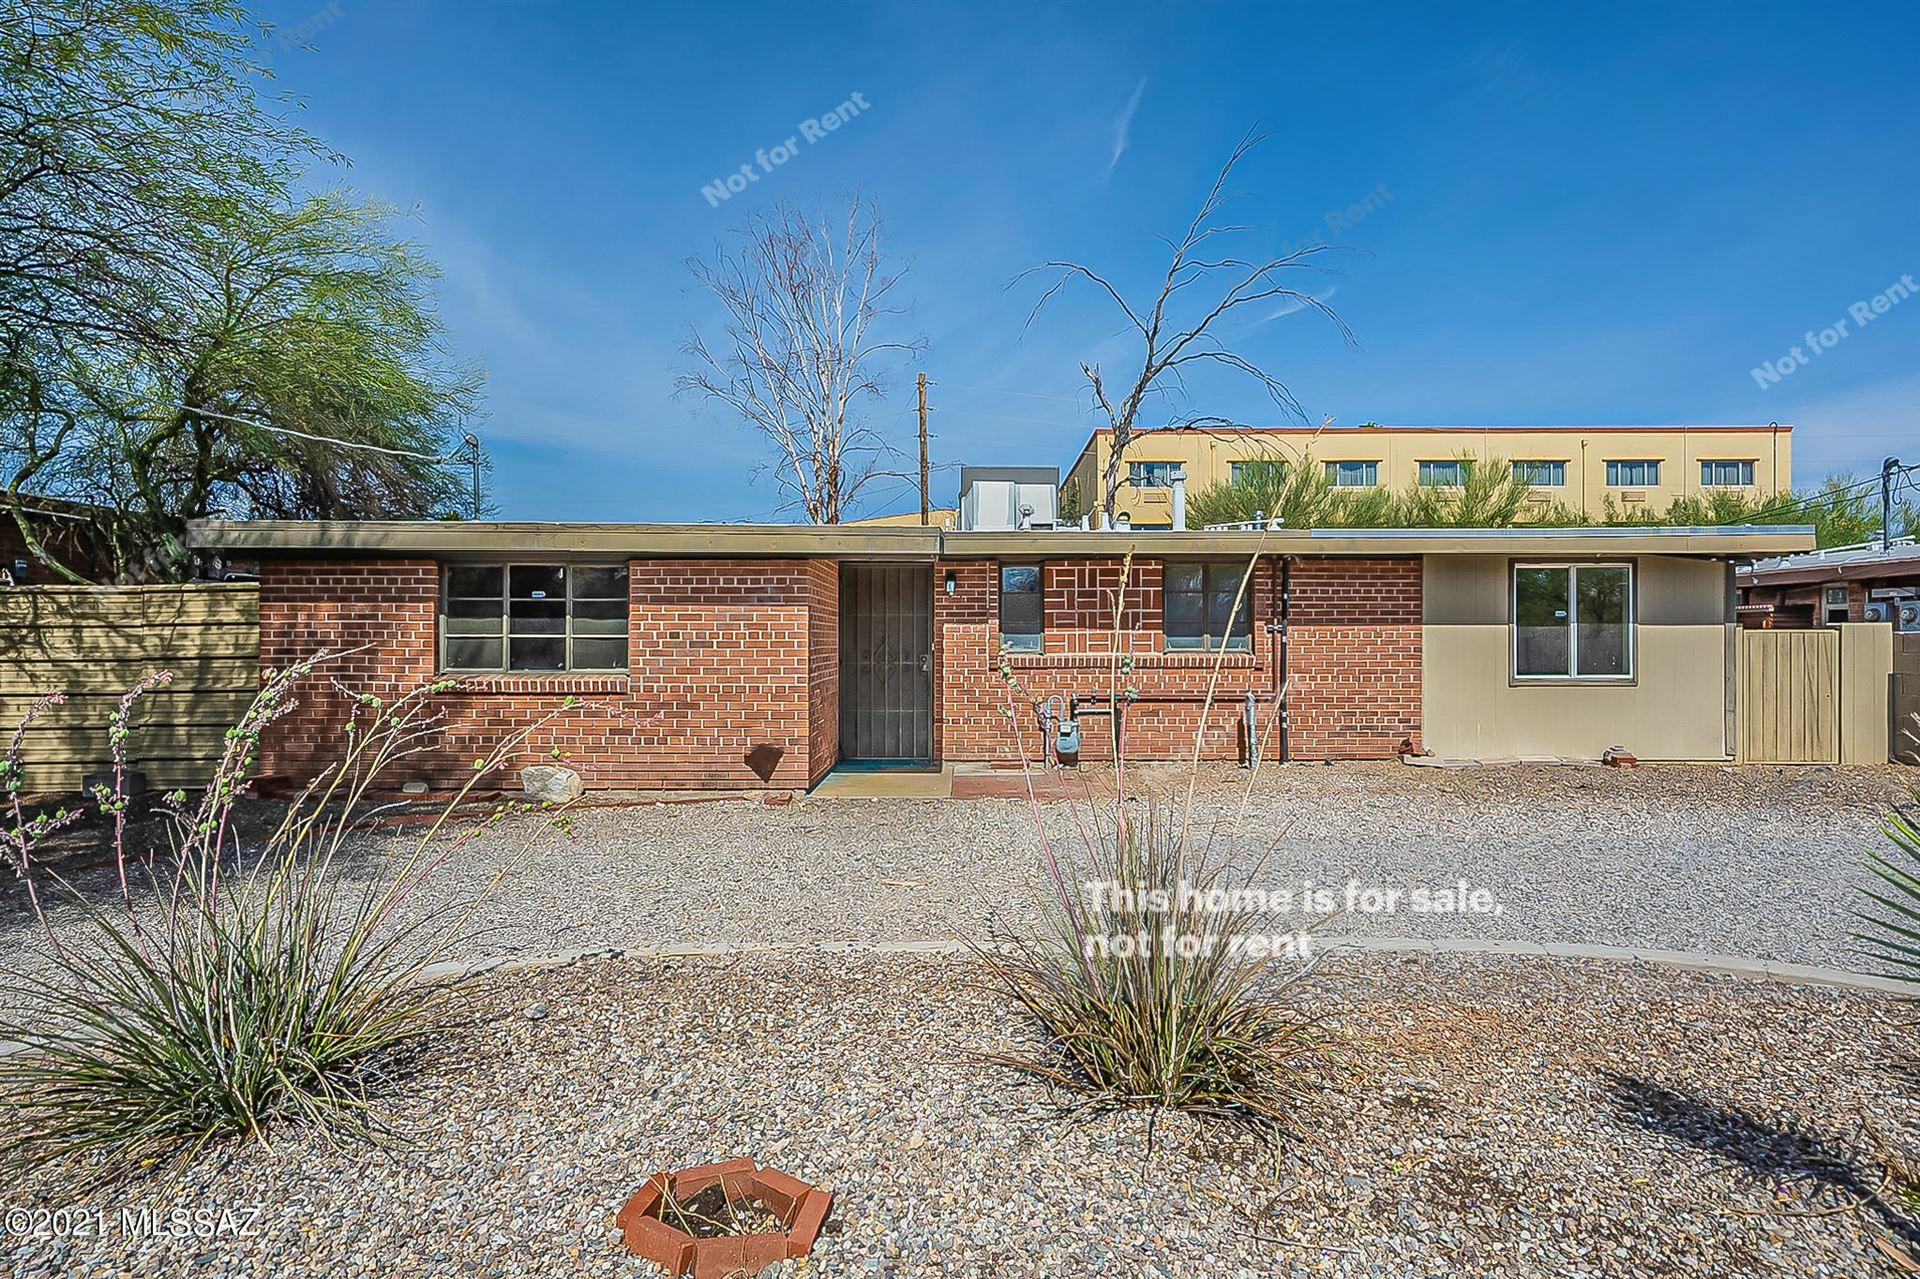 109 N Longfellow Avenue, Tucson, AZ 85711 - MLS#: 22114687